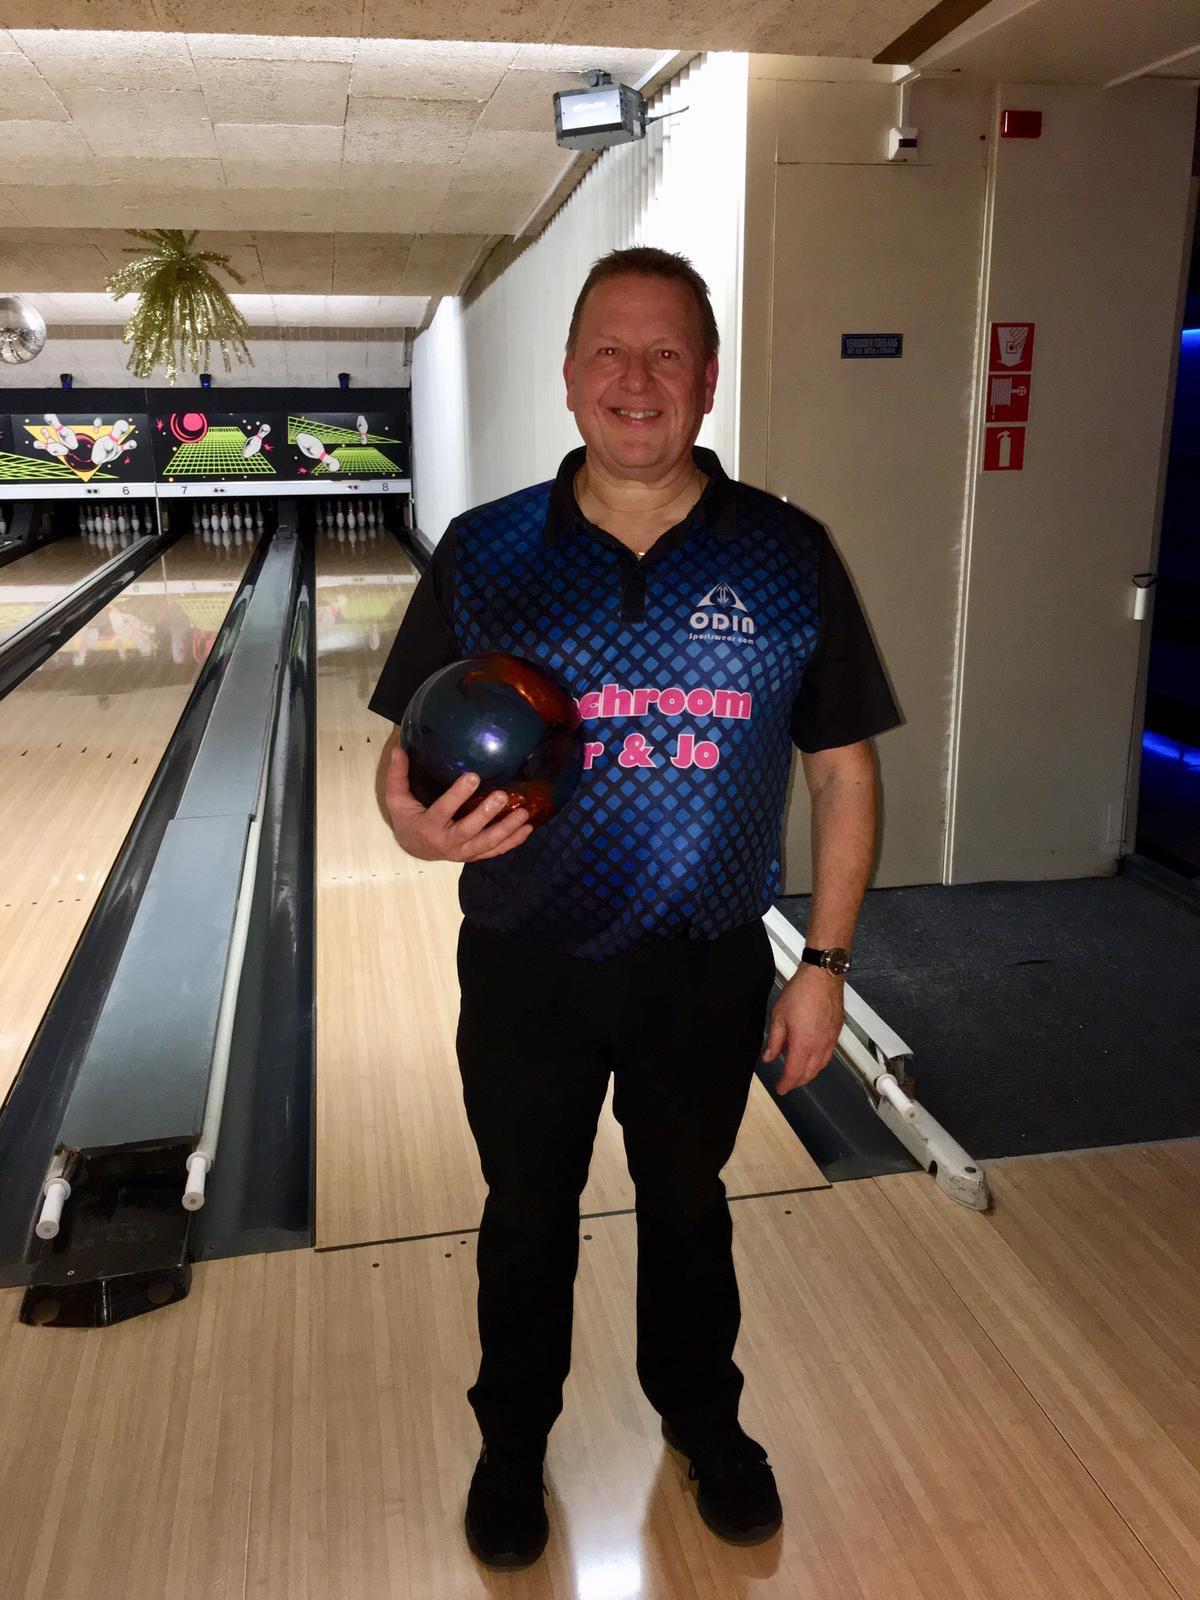 http://www.bowlingverenigingheiloo.nl/wall_of_fame/foto's/2019_1210-300Game Martin Spoelstra.jpg